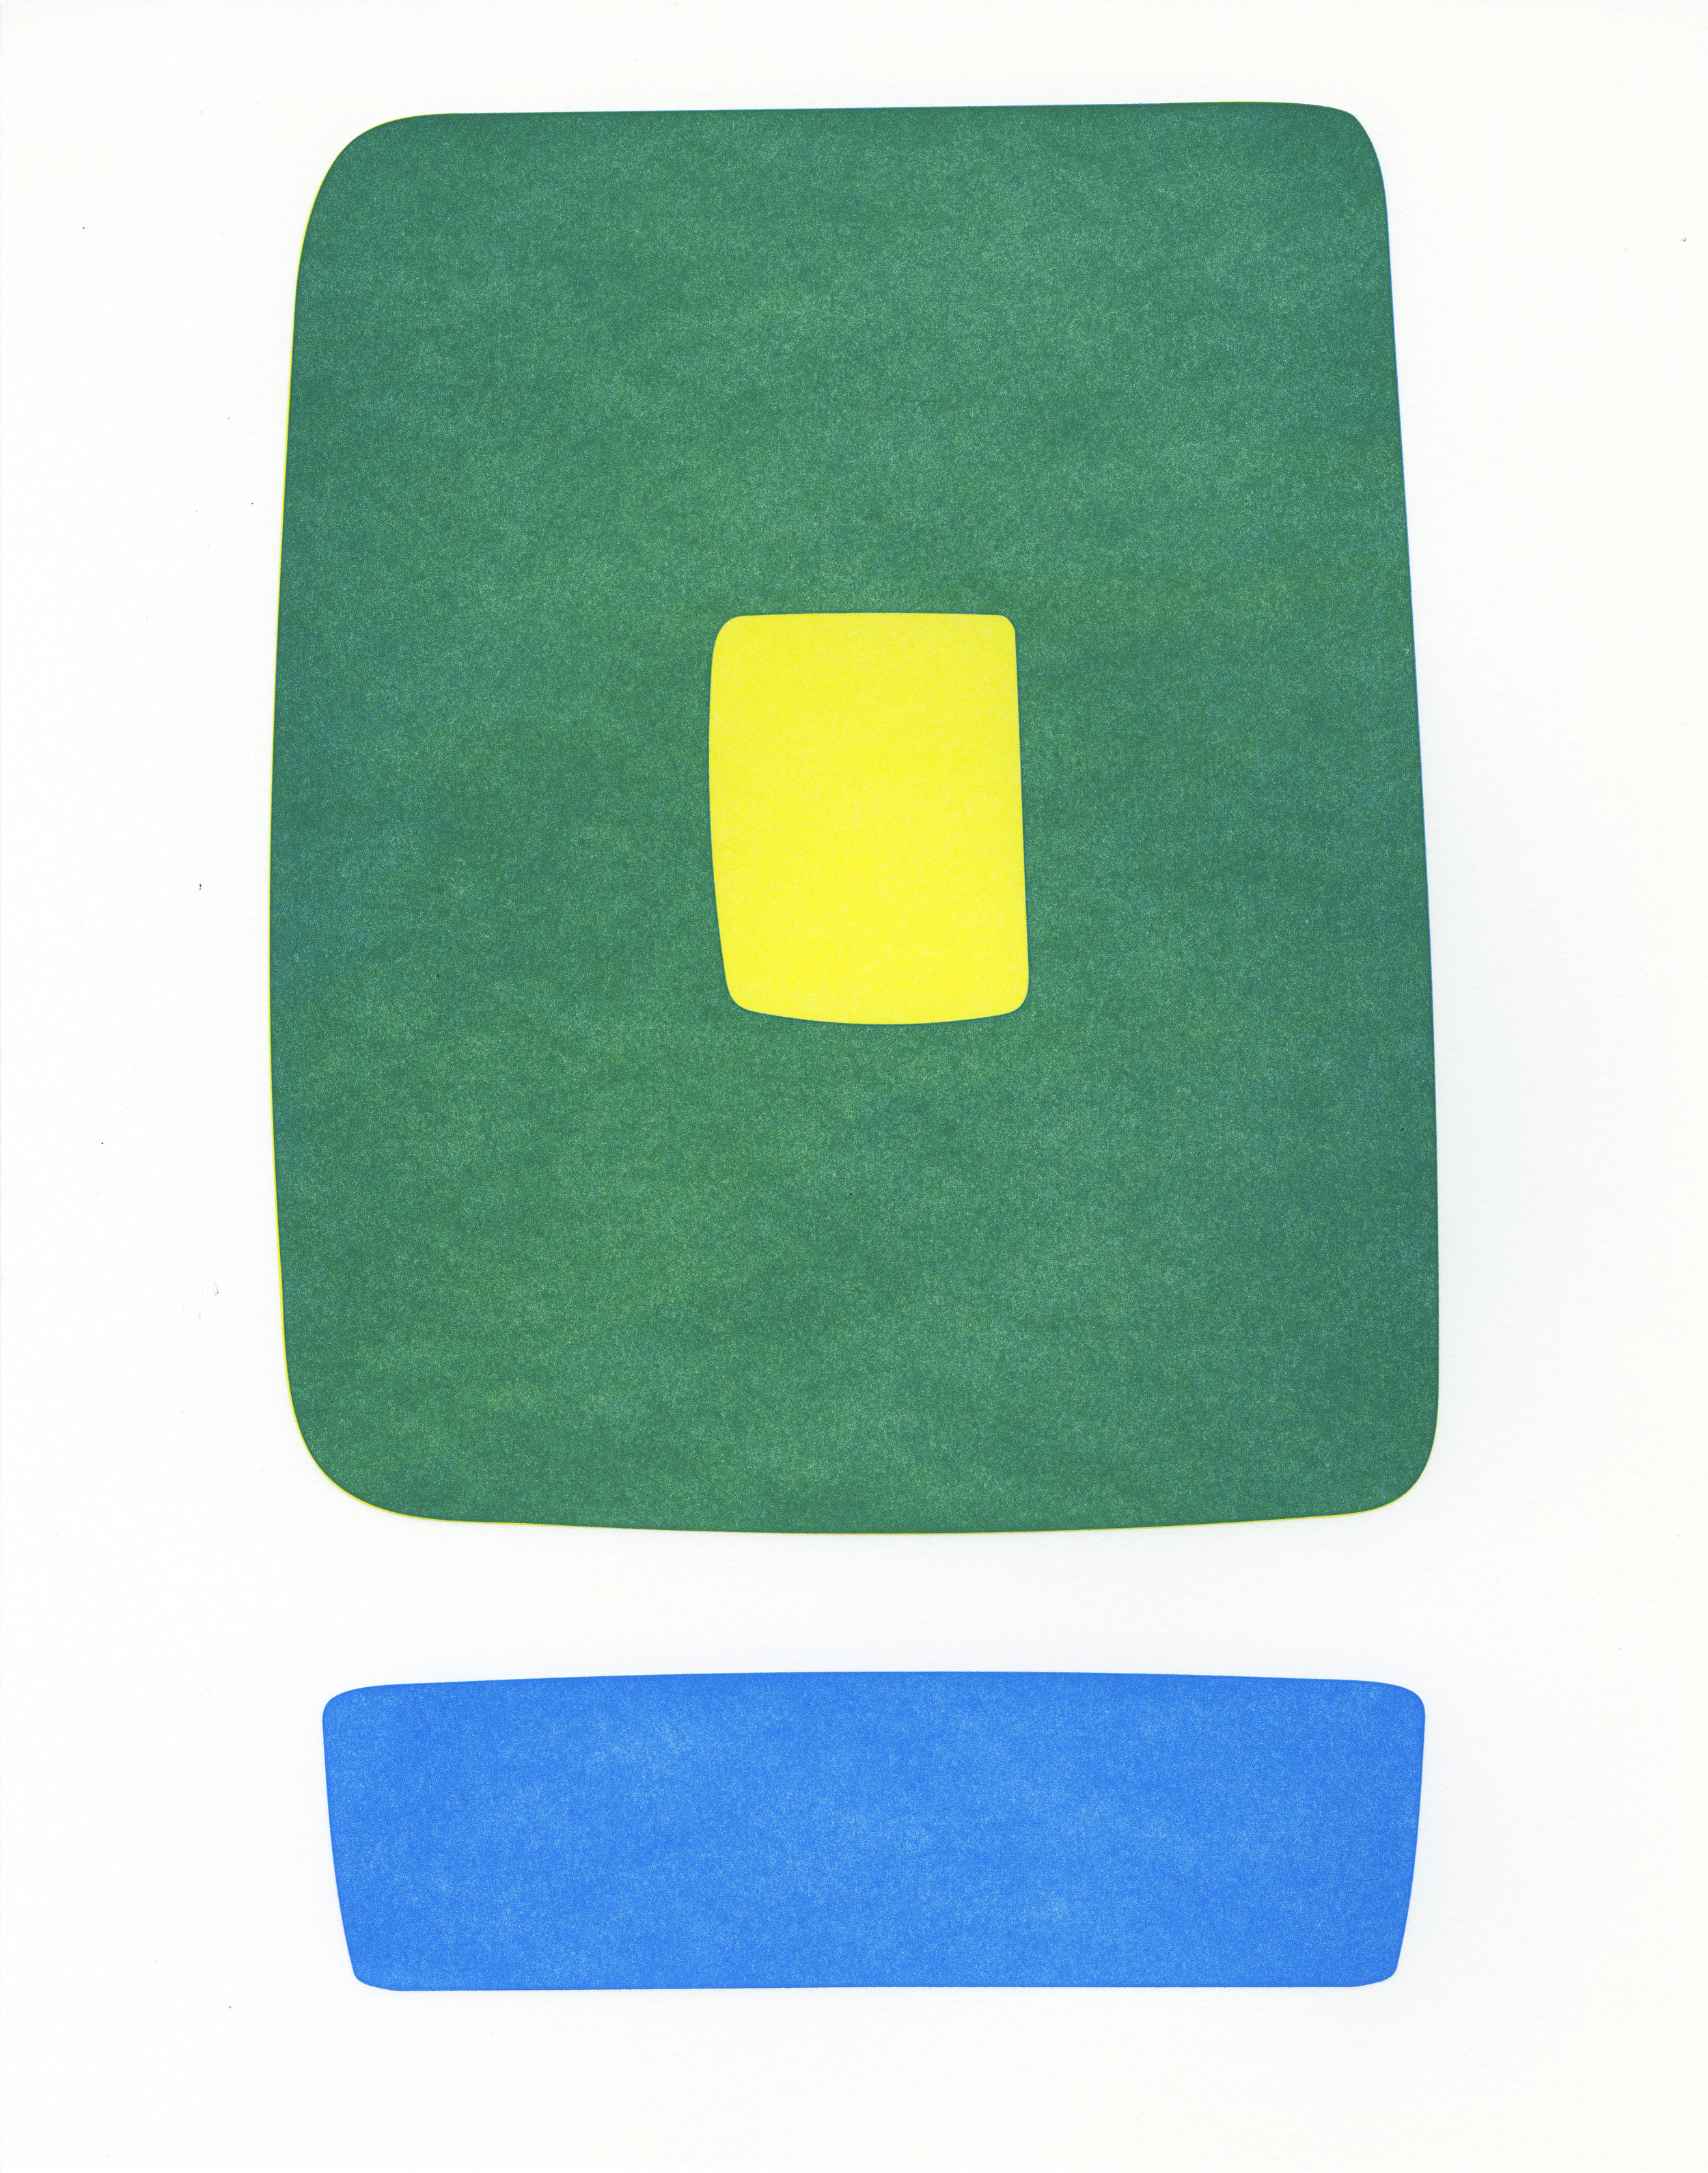 "cyg, 2016, letterpress, 10"" x 8"""